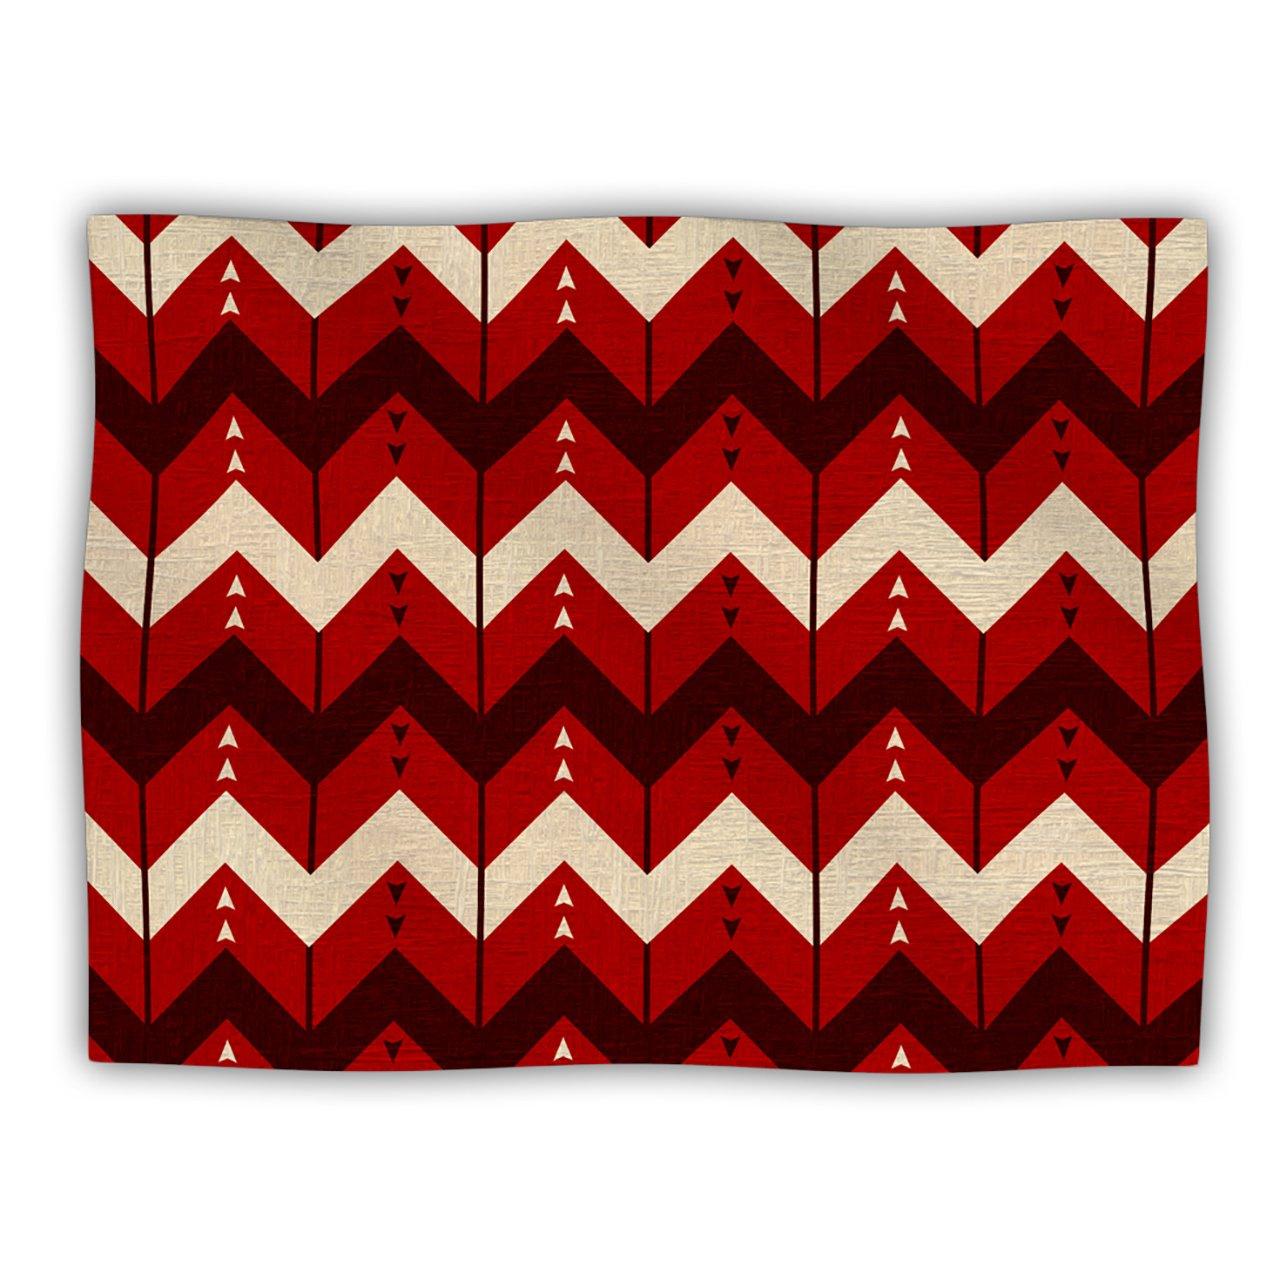 Kess InHouse Nick Atkinson 'Chevron Dance Red' Dog Blanket, 40 by 30-Inch